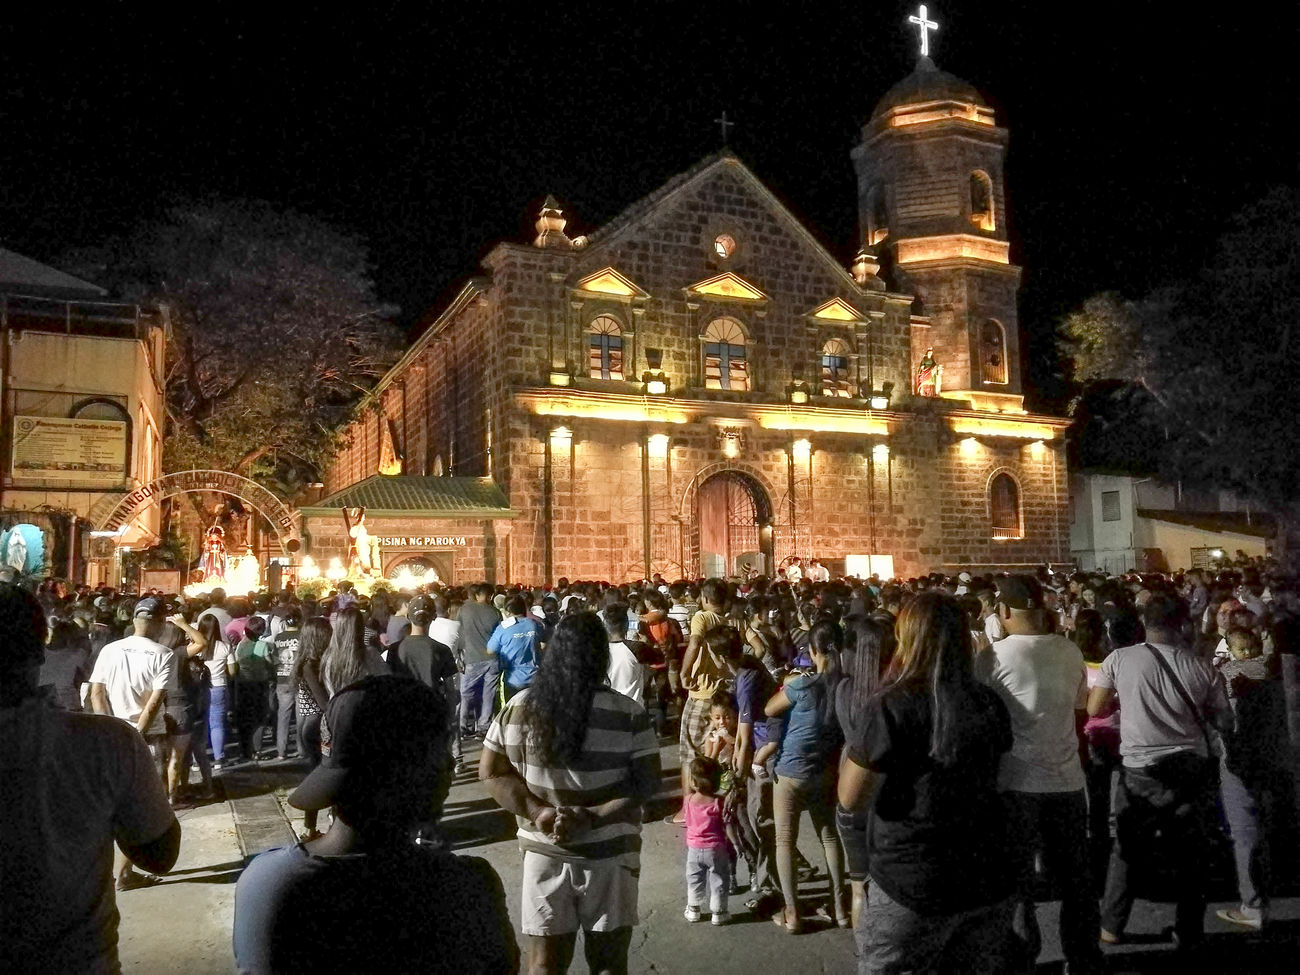 Semana Santa. Illuminated Night Architecture Large Group Of People People Tree